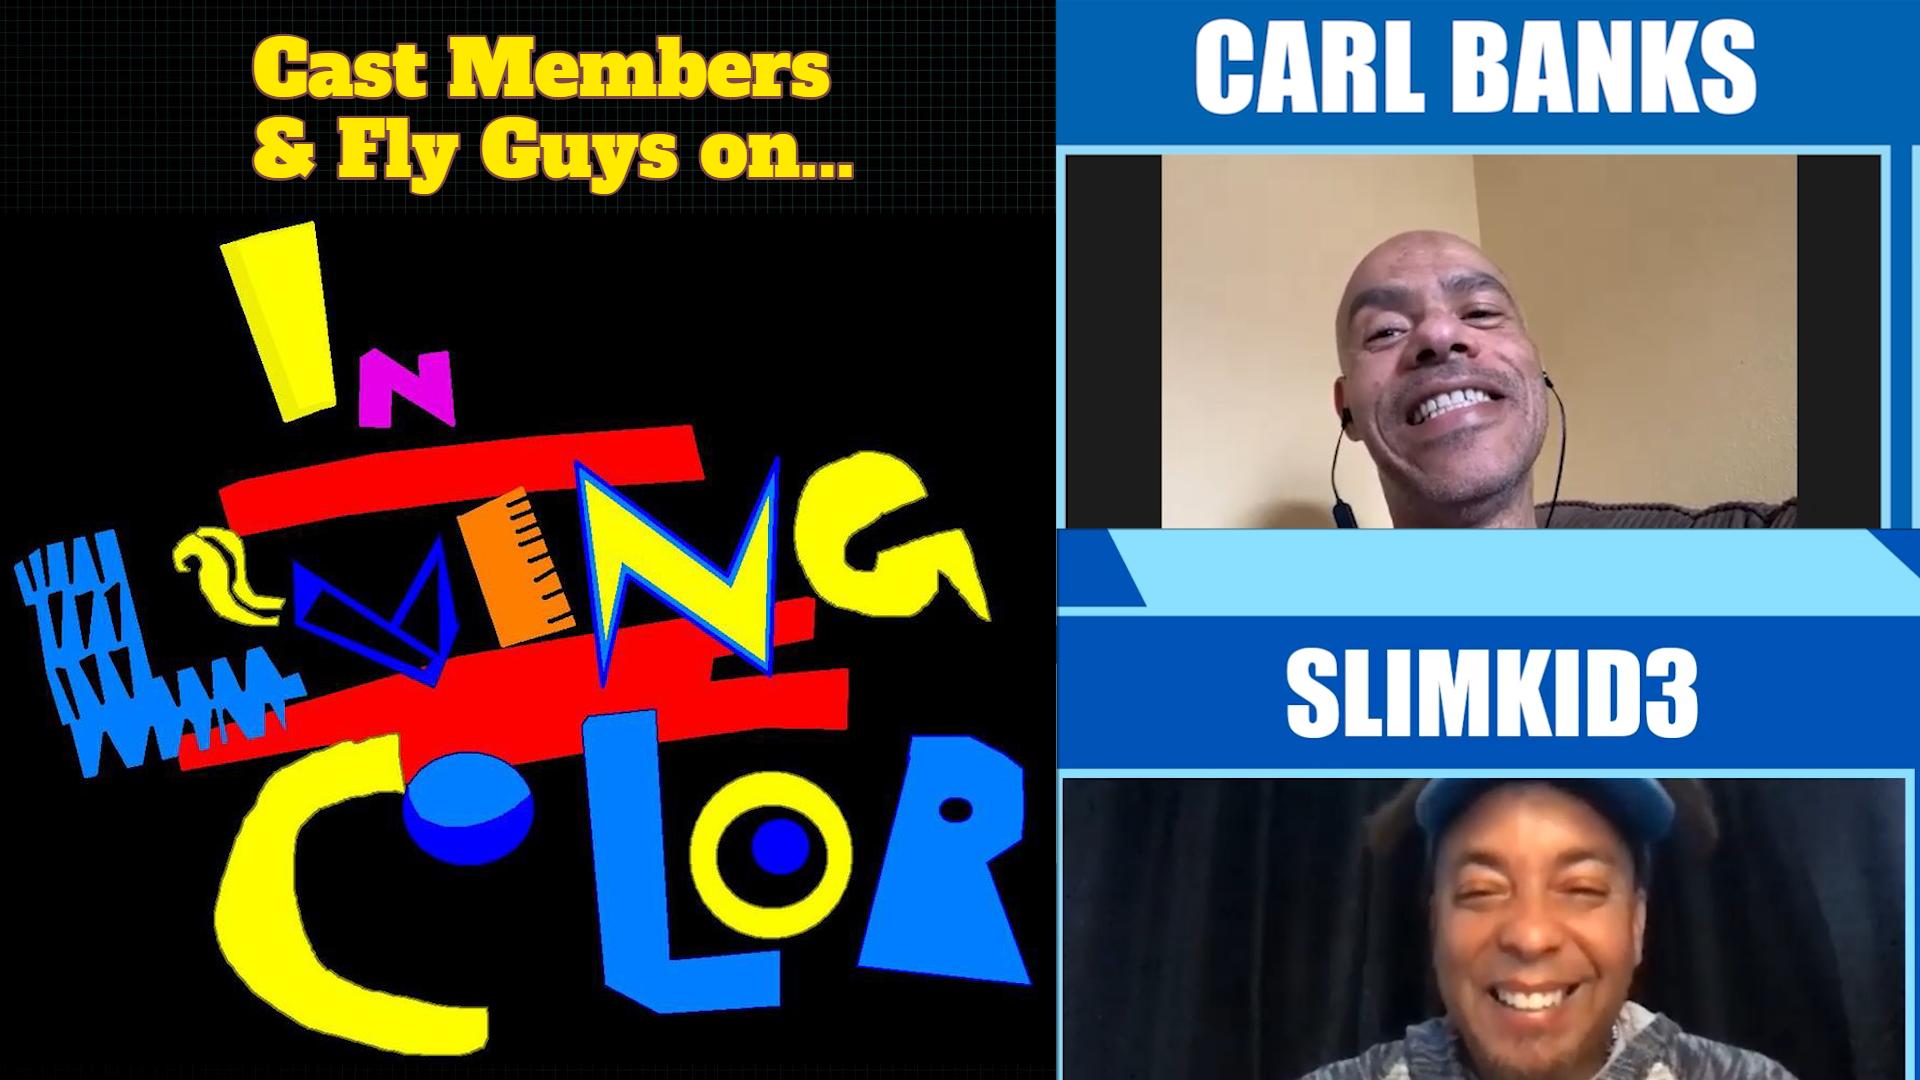 Carl Banks Slimkid3 Pharcyde rapper cast member actor fly guy funny humor story interview 90's show tv sketch comedian